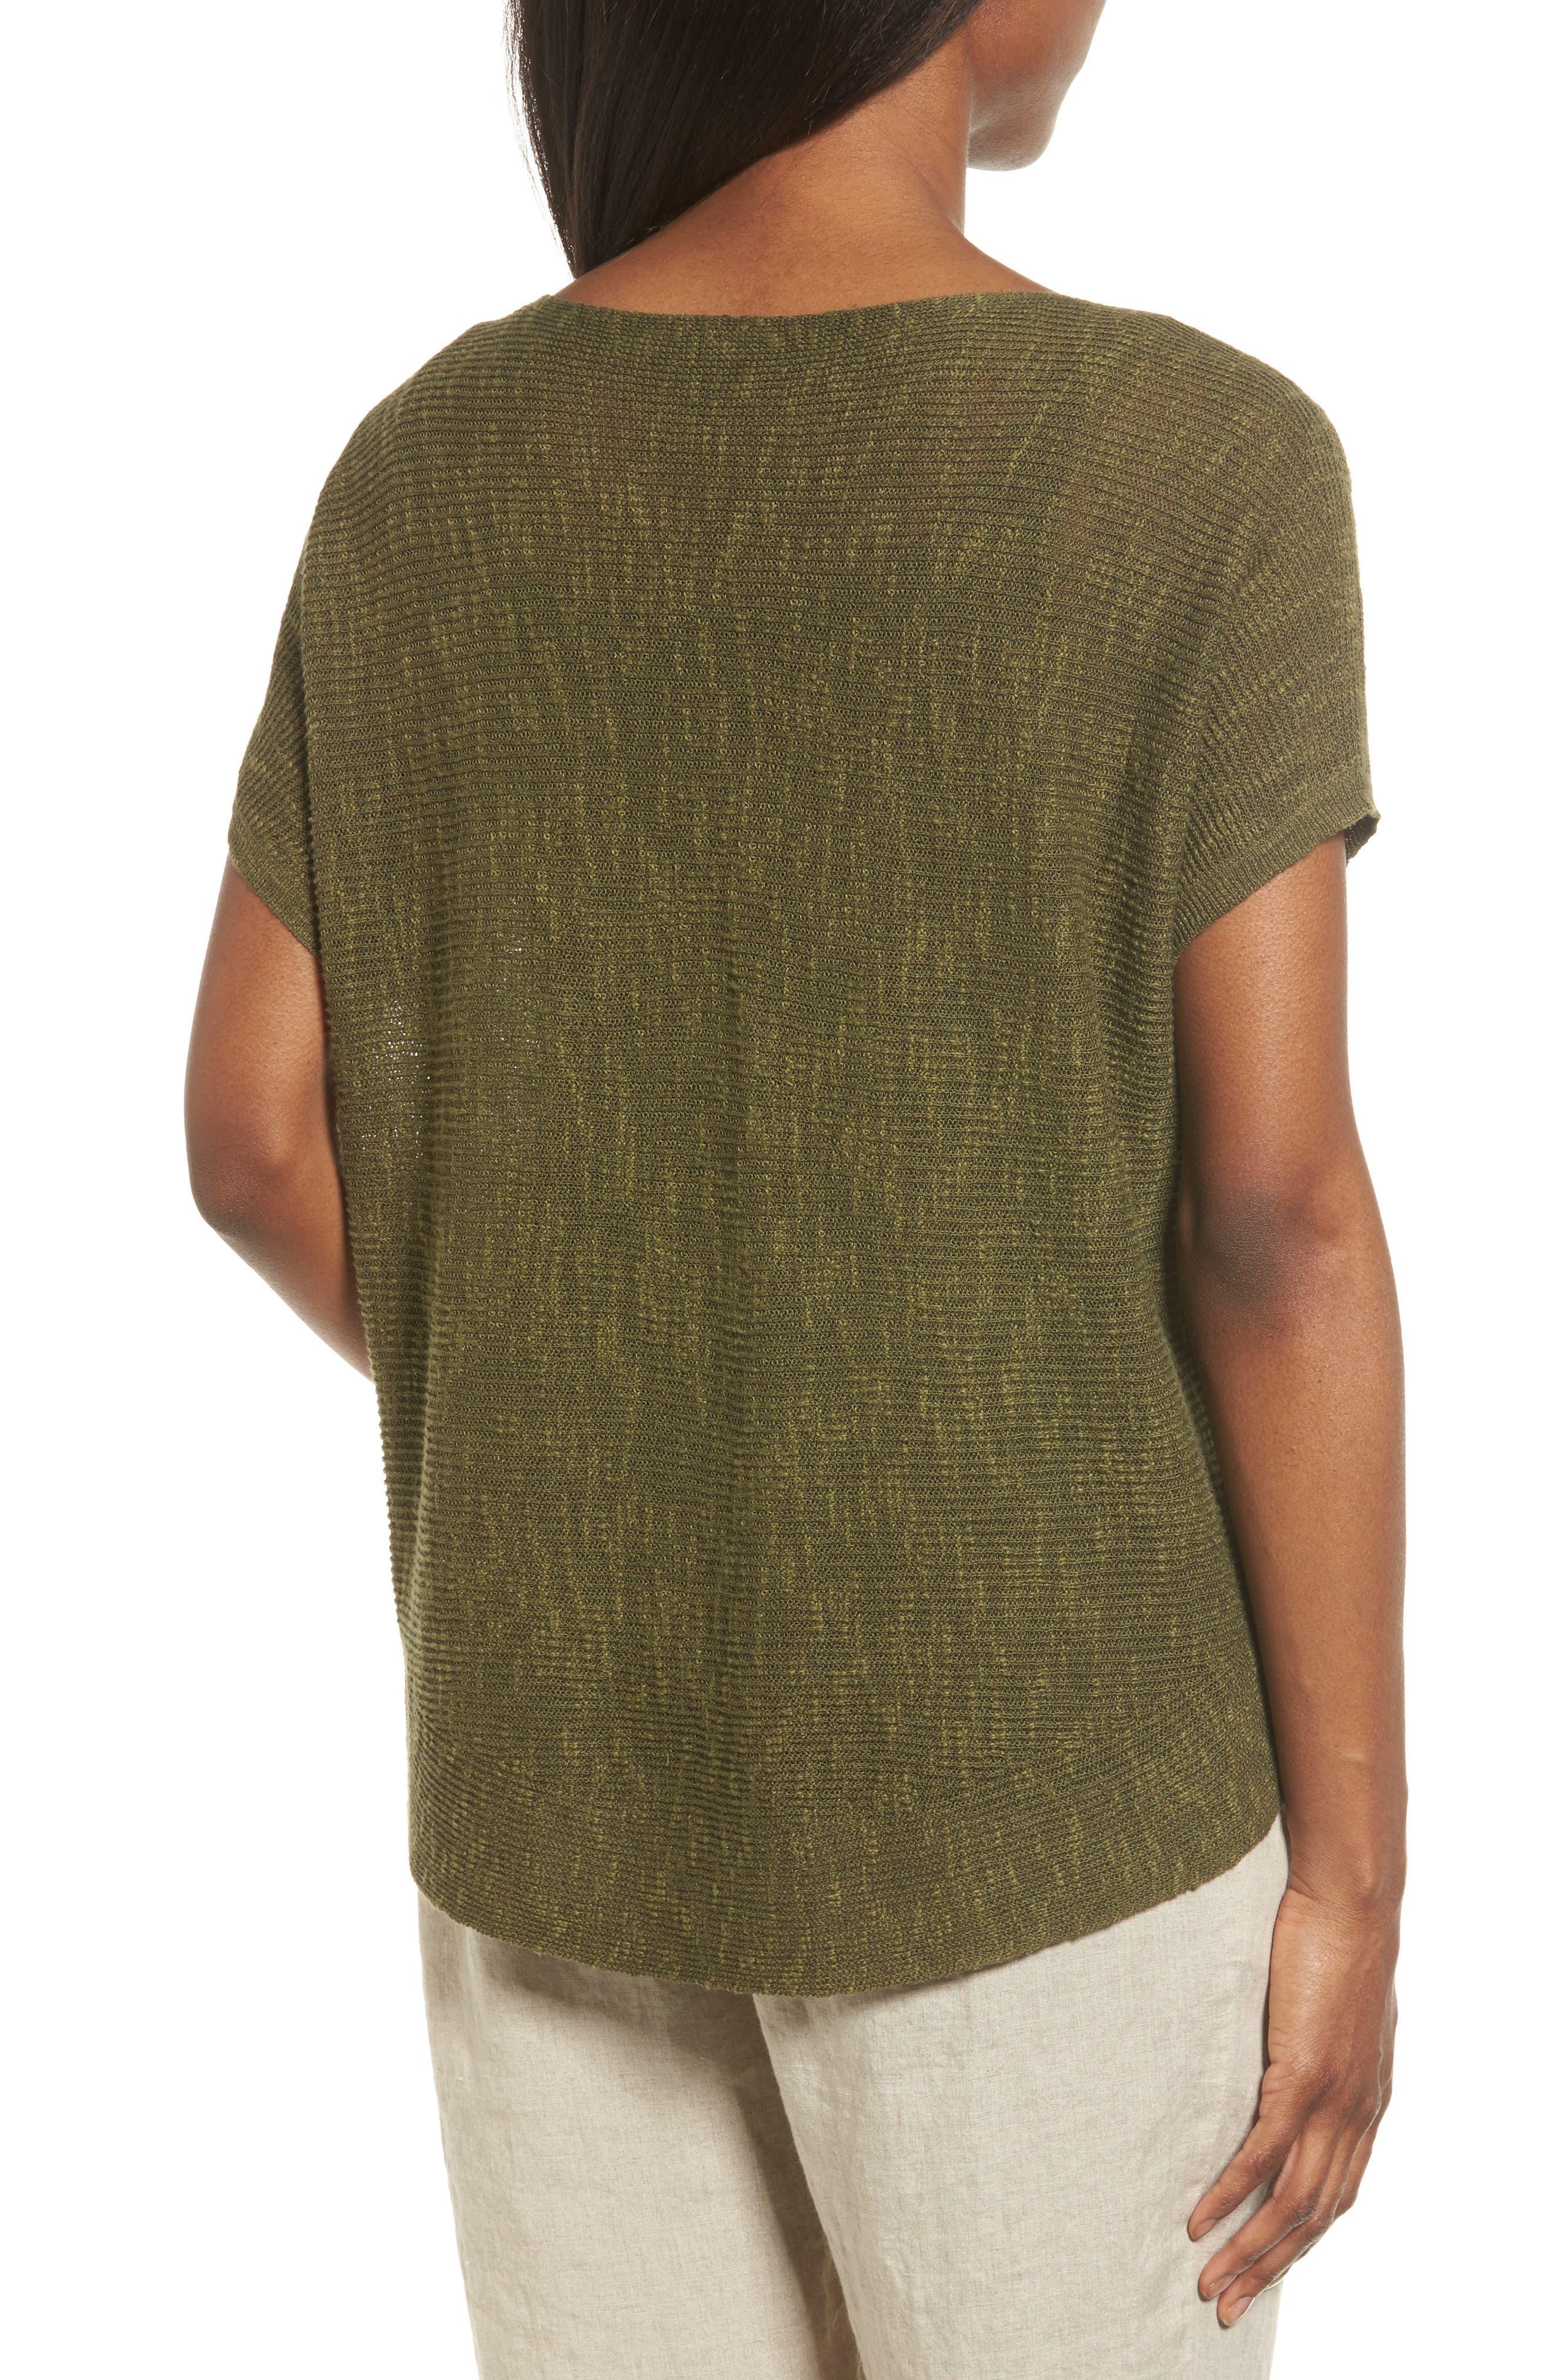 Organic Linen & Cotton Knit Top,                             Alternate thumbnail 2, color,                             Olive